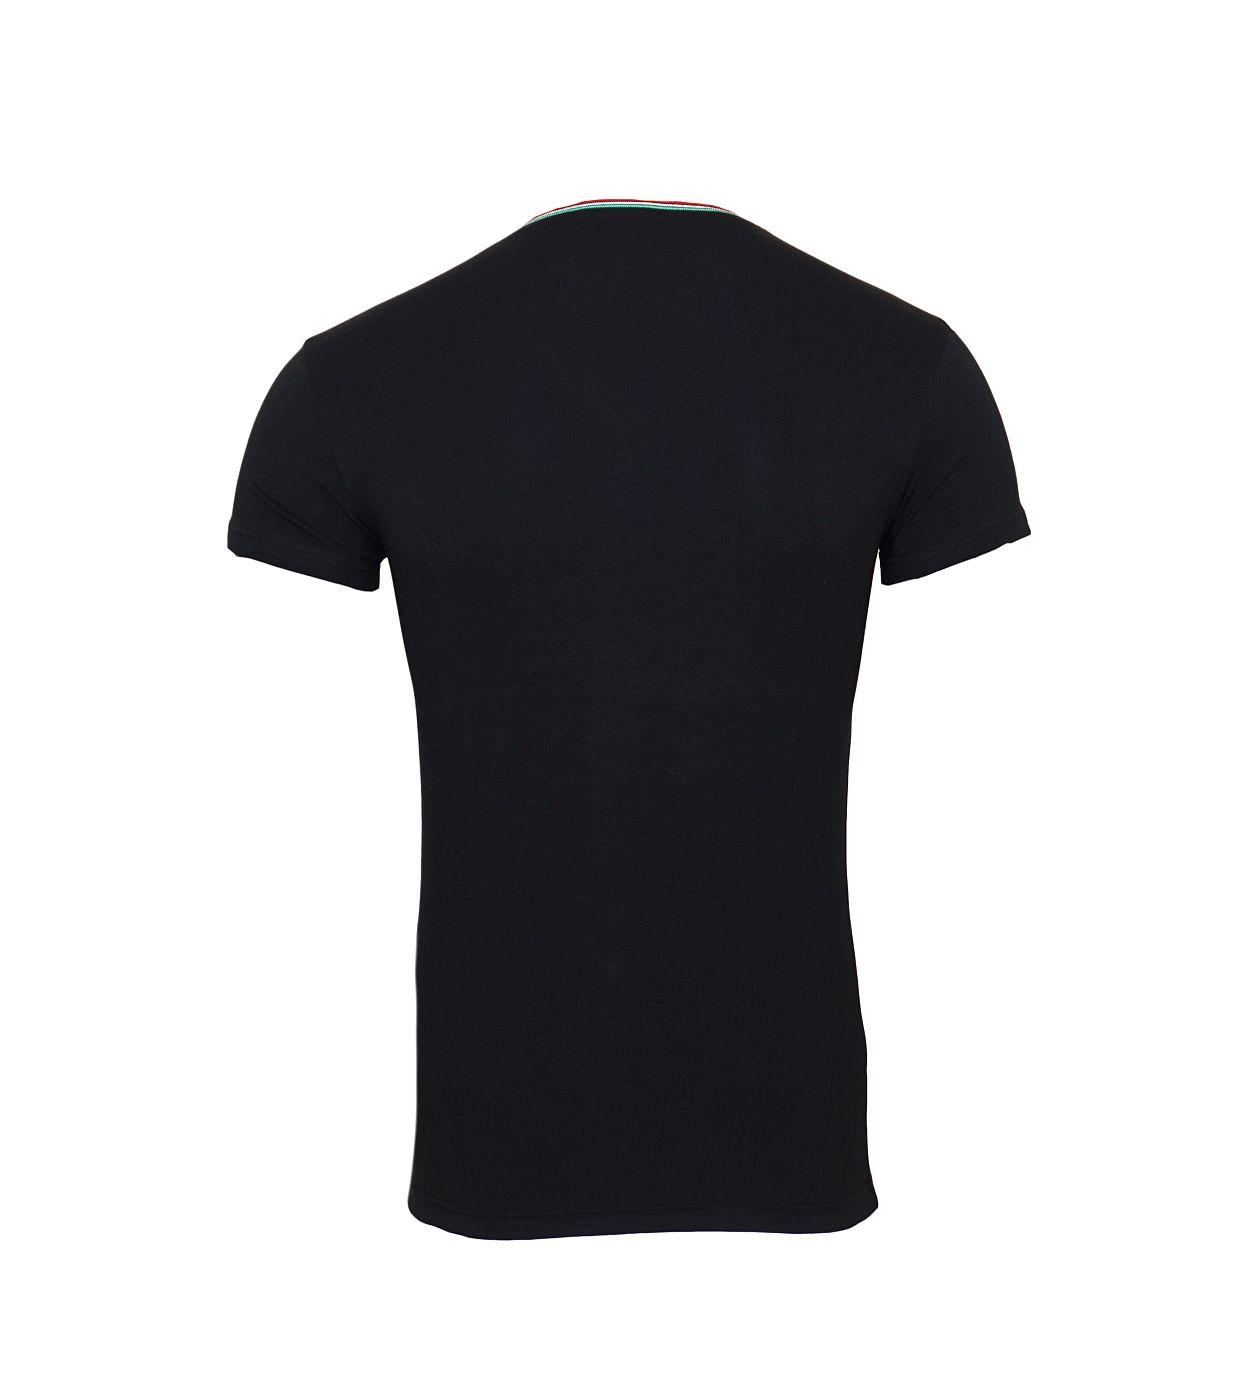 Emporio Armani T-Shirts V-Ausschnitt 110810 8A510 00020 NERO SH18-EAT2